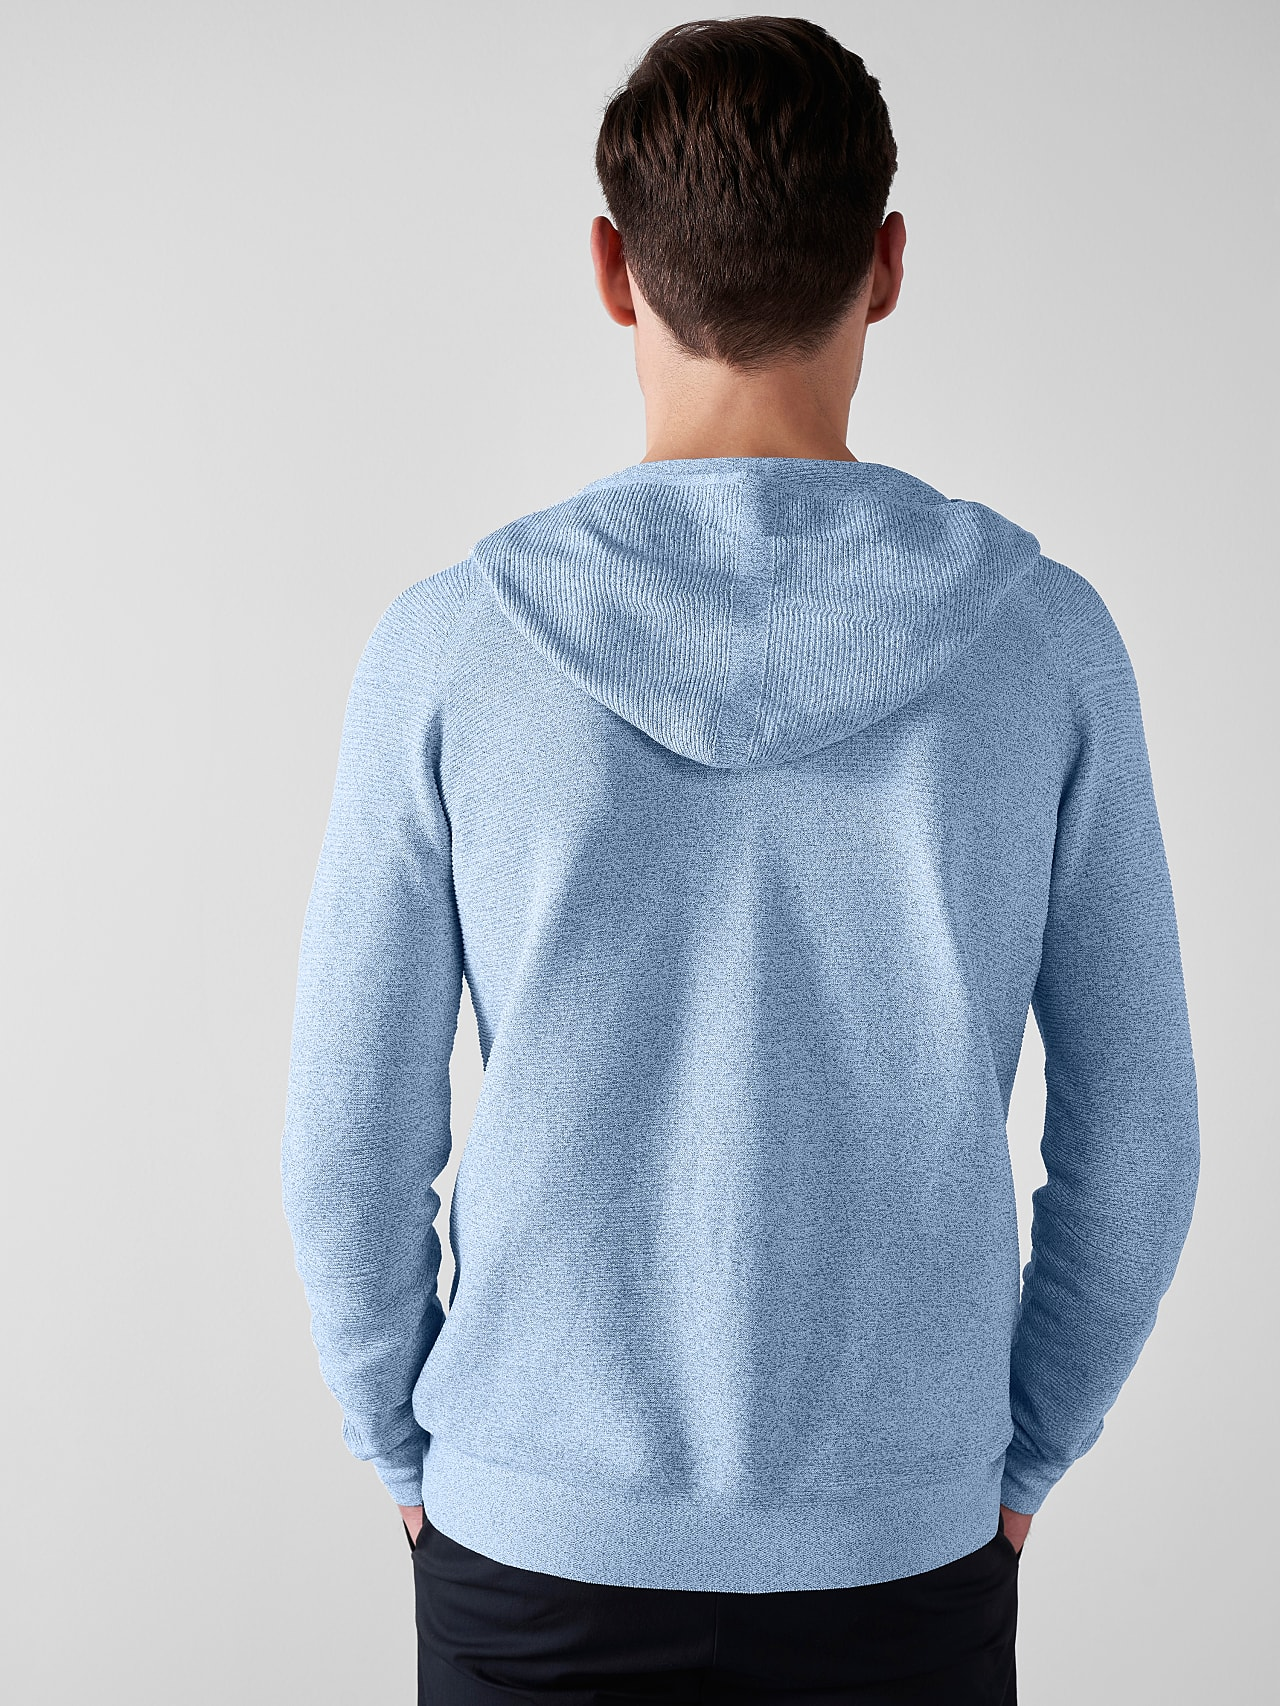 FURAP V3.Y5.01 Seamless Knit Hoodie blue / white Front Main Alpha Tauri